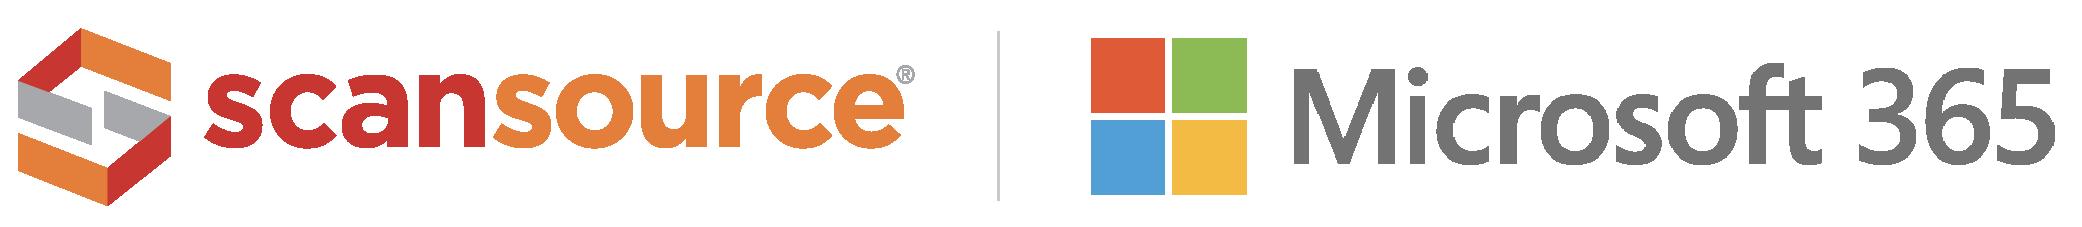 ScanSource + Microsoft 365